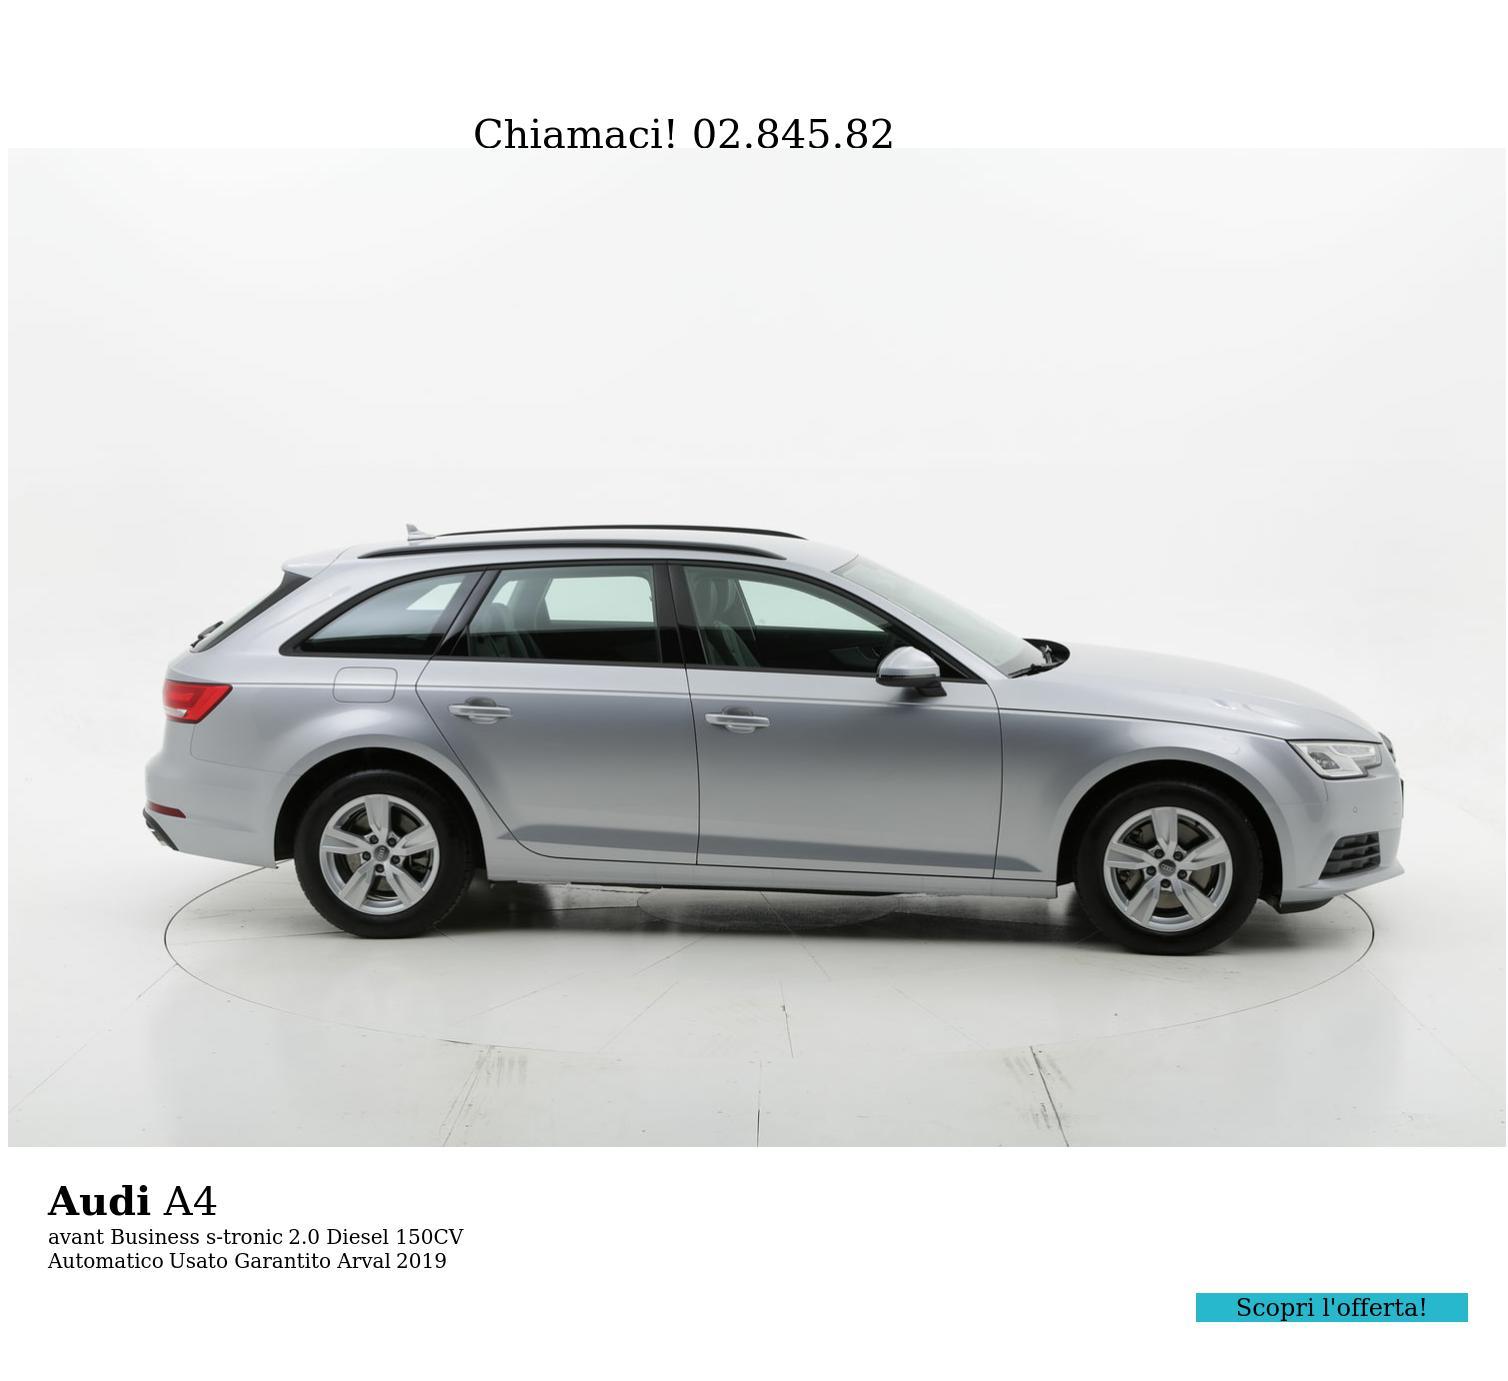 Audi A4 avant Business s-tronic km 0 diesel grigia | brumbrum